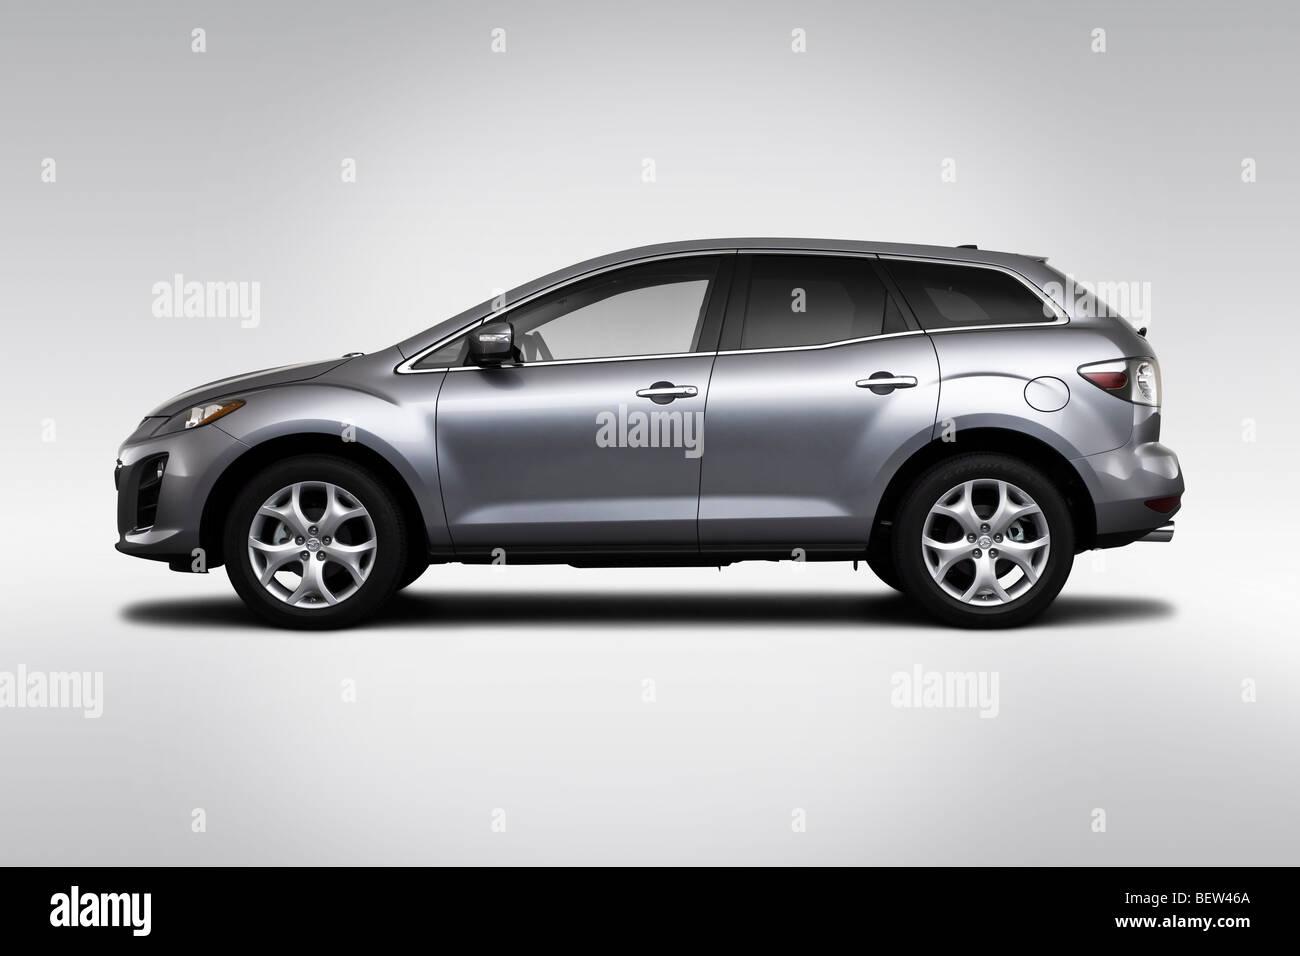 https://c8.alamy.com/comp/BEW46A/2010-mazda-cx-7-grand-touring-in-silver-drivers-side-profile-BEW46A.jpg